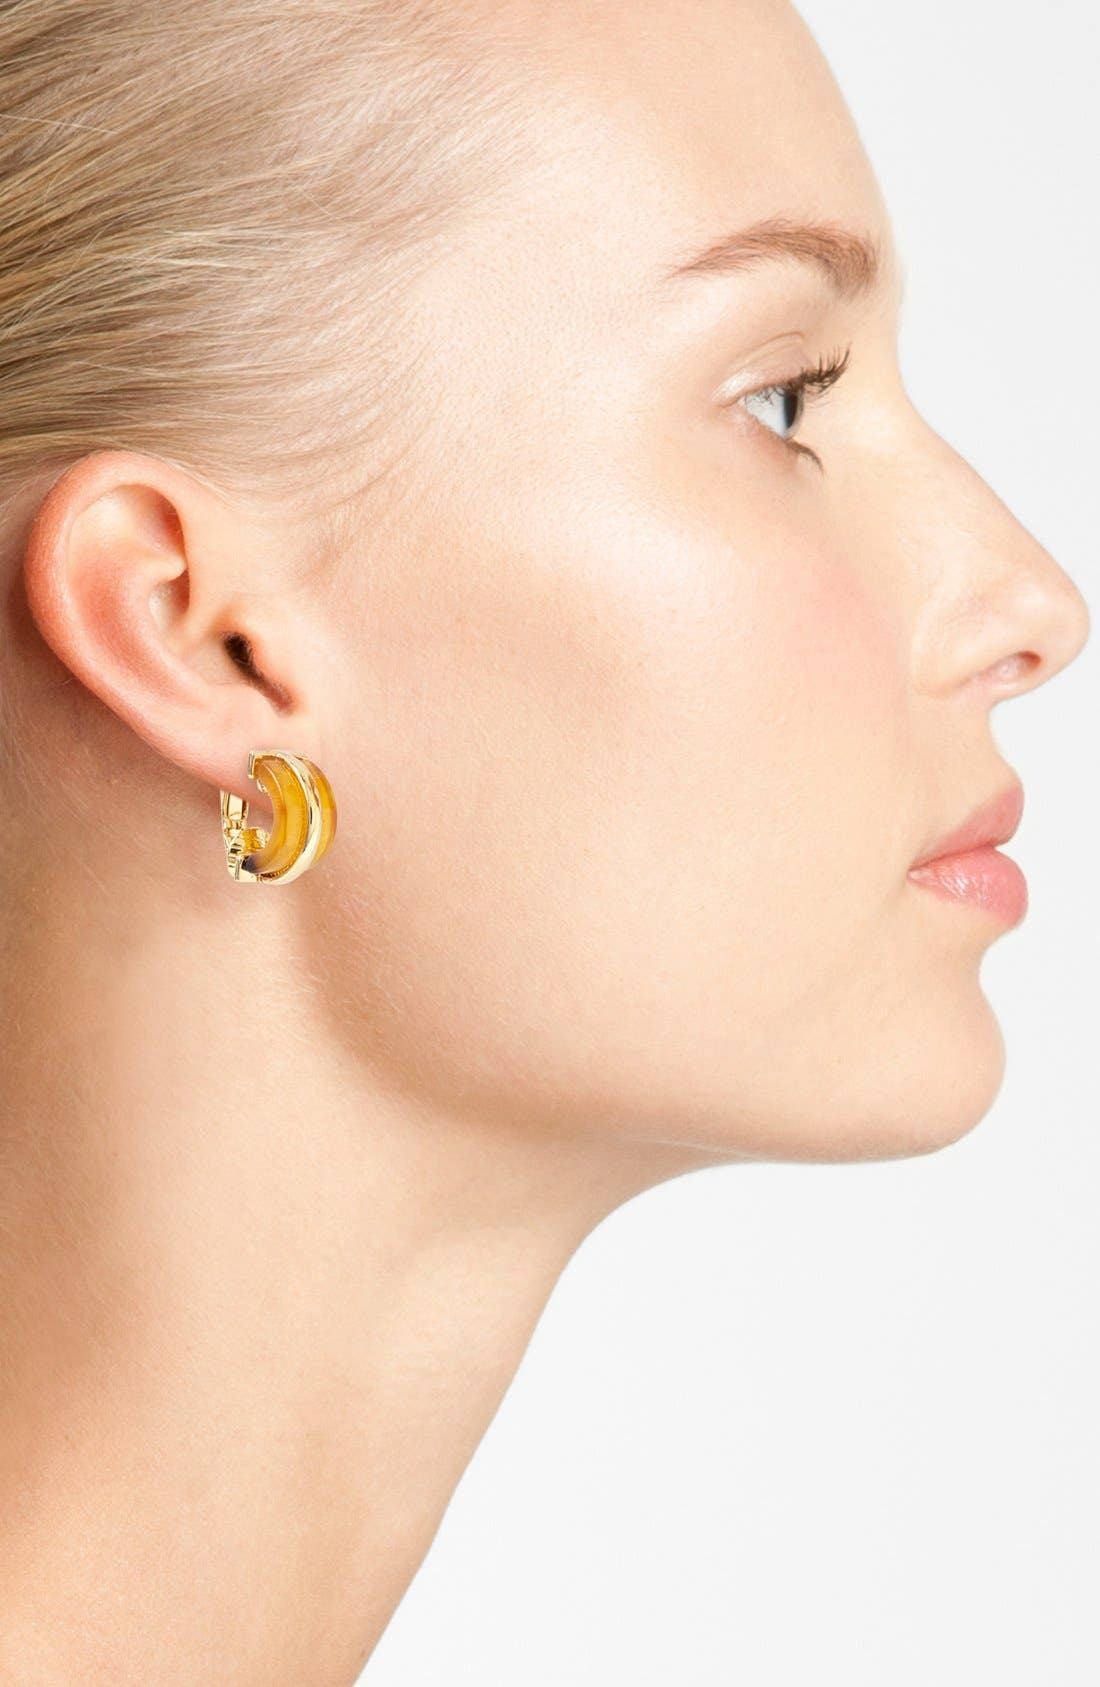 Small Clip Earrings,                             Alternate thumbnail 2, color,                             200